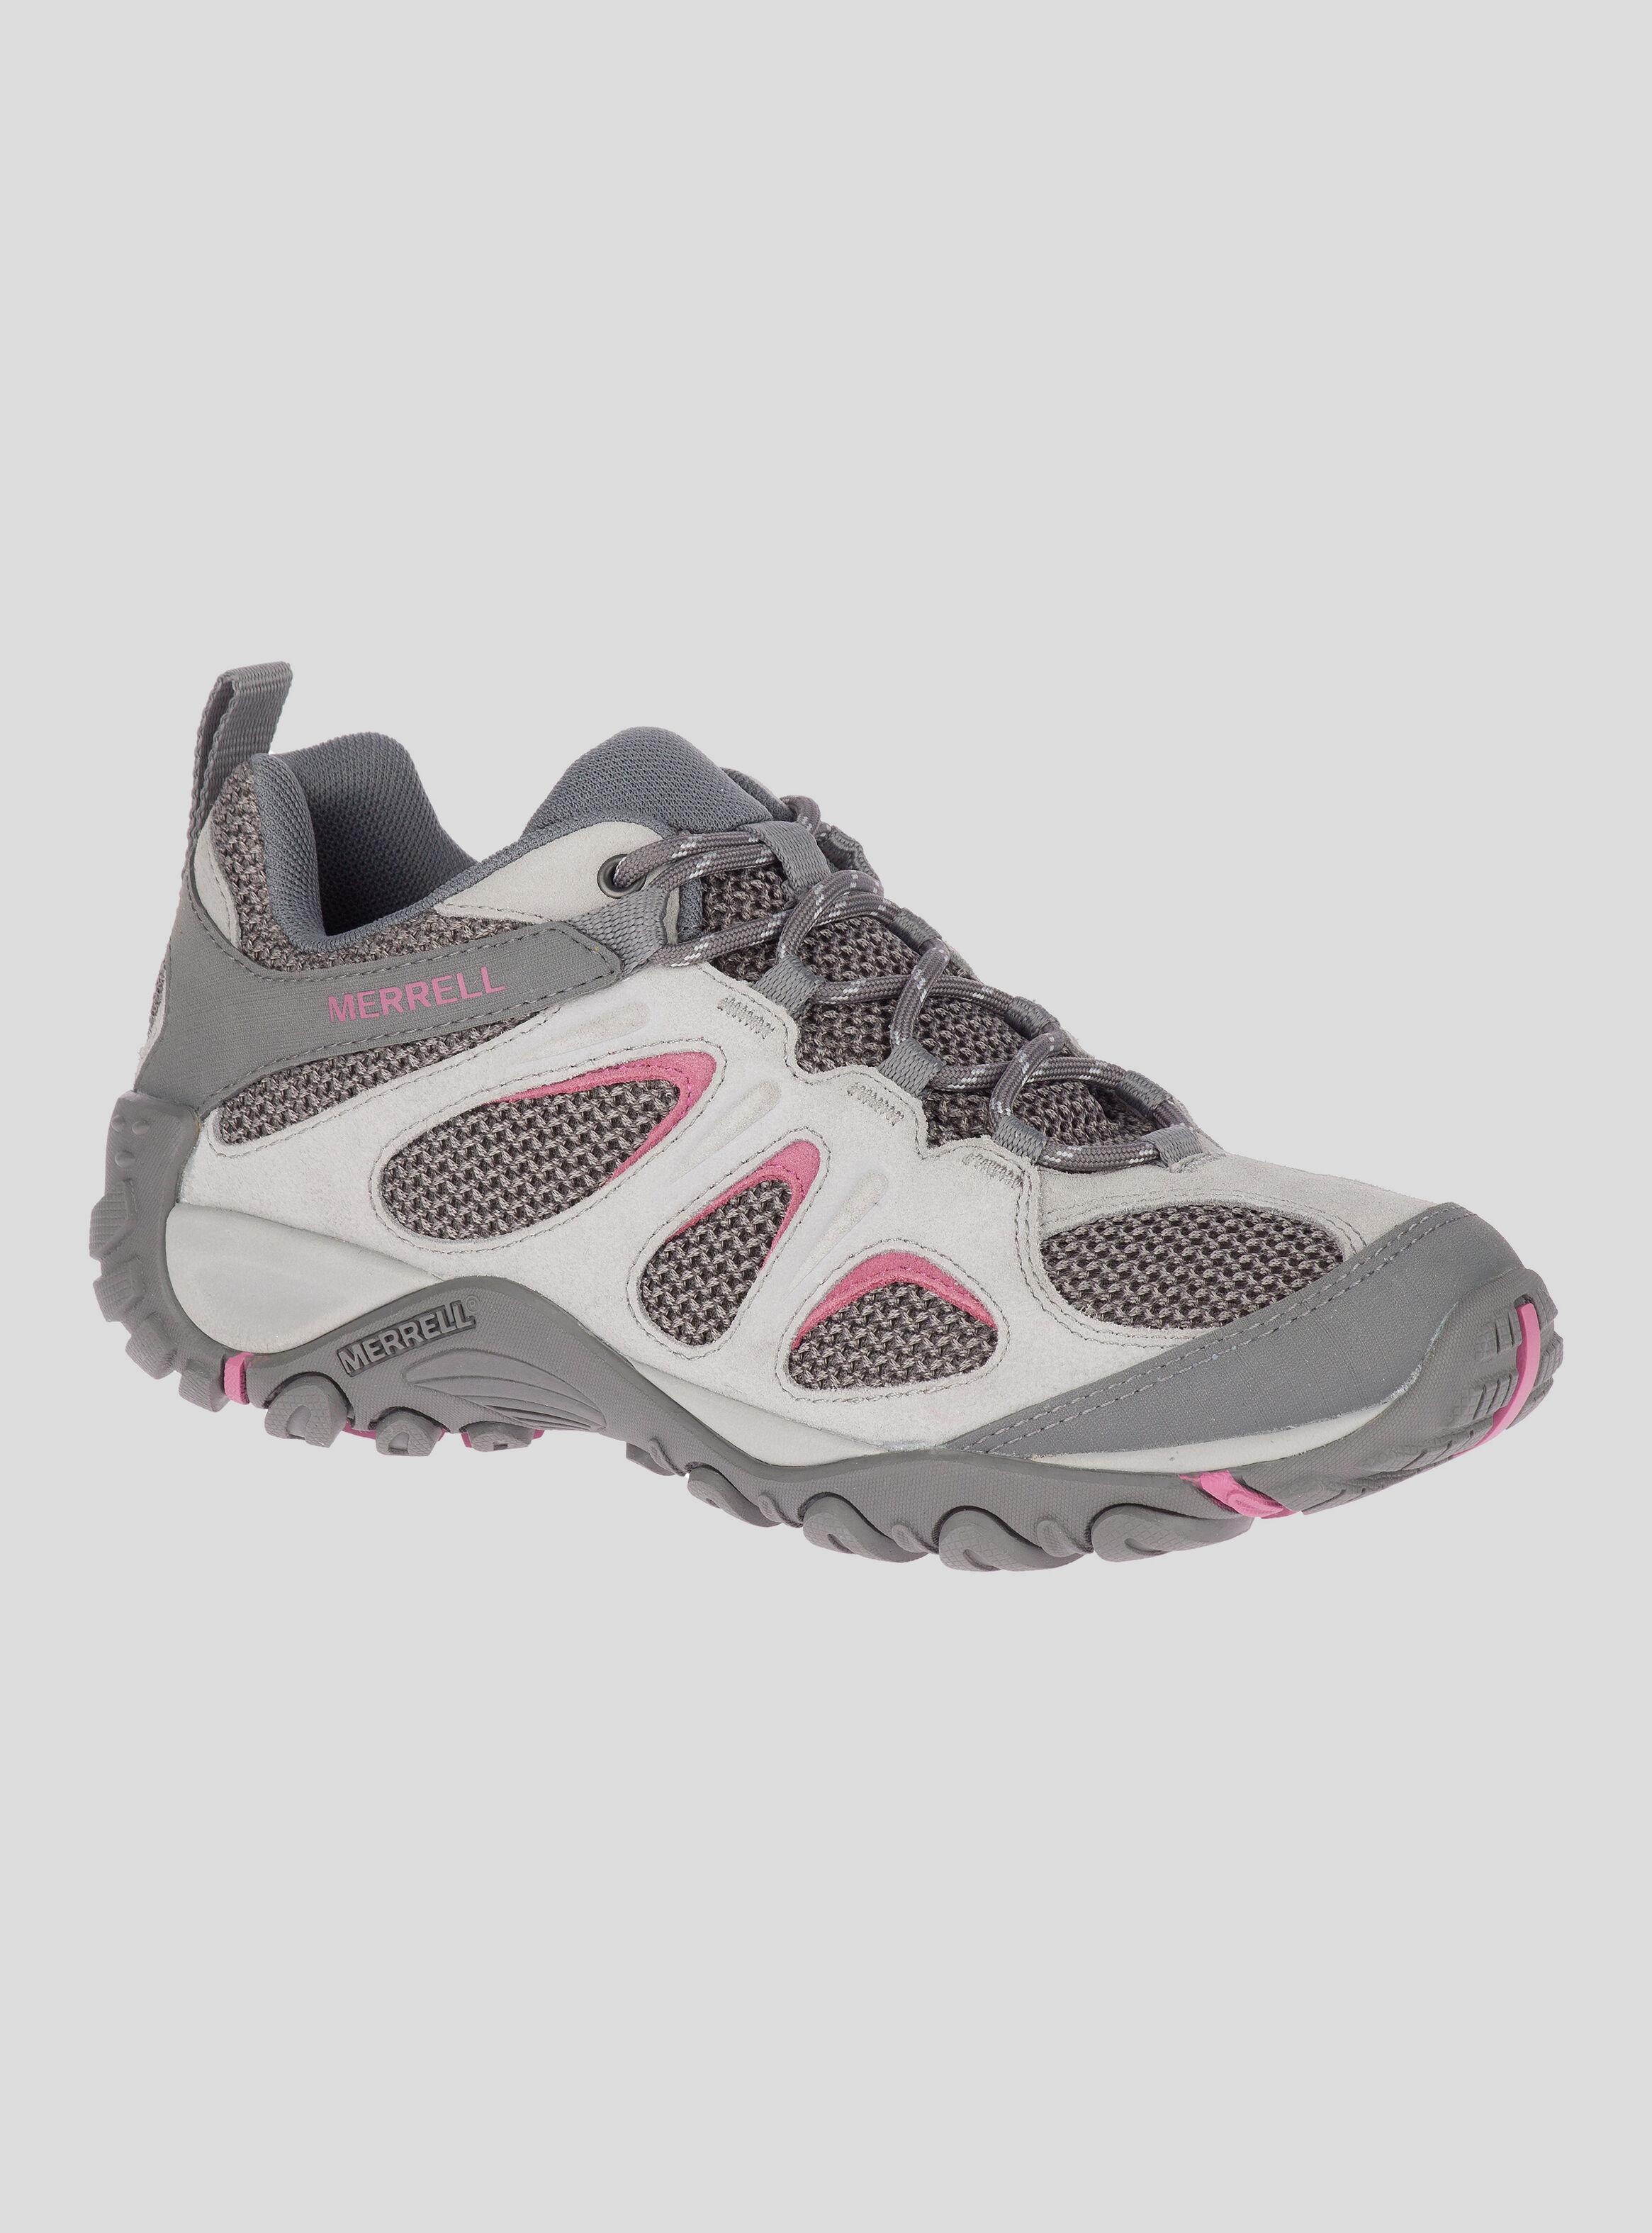 zapatos merrell hombre paris peru